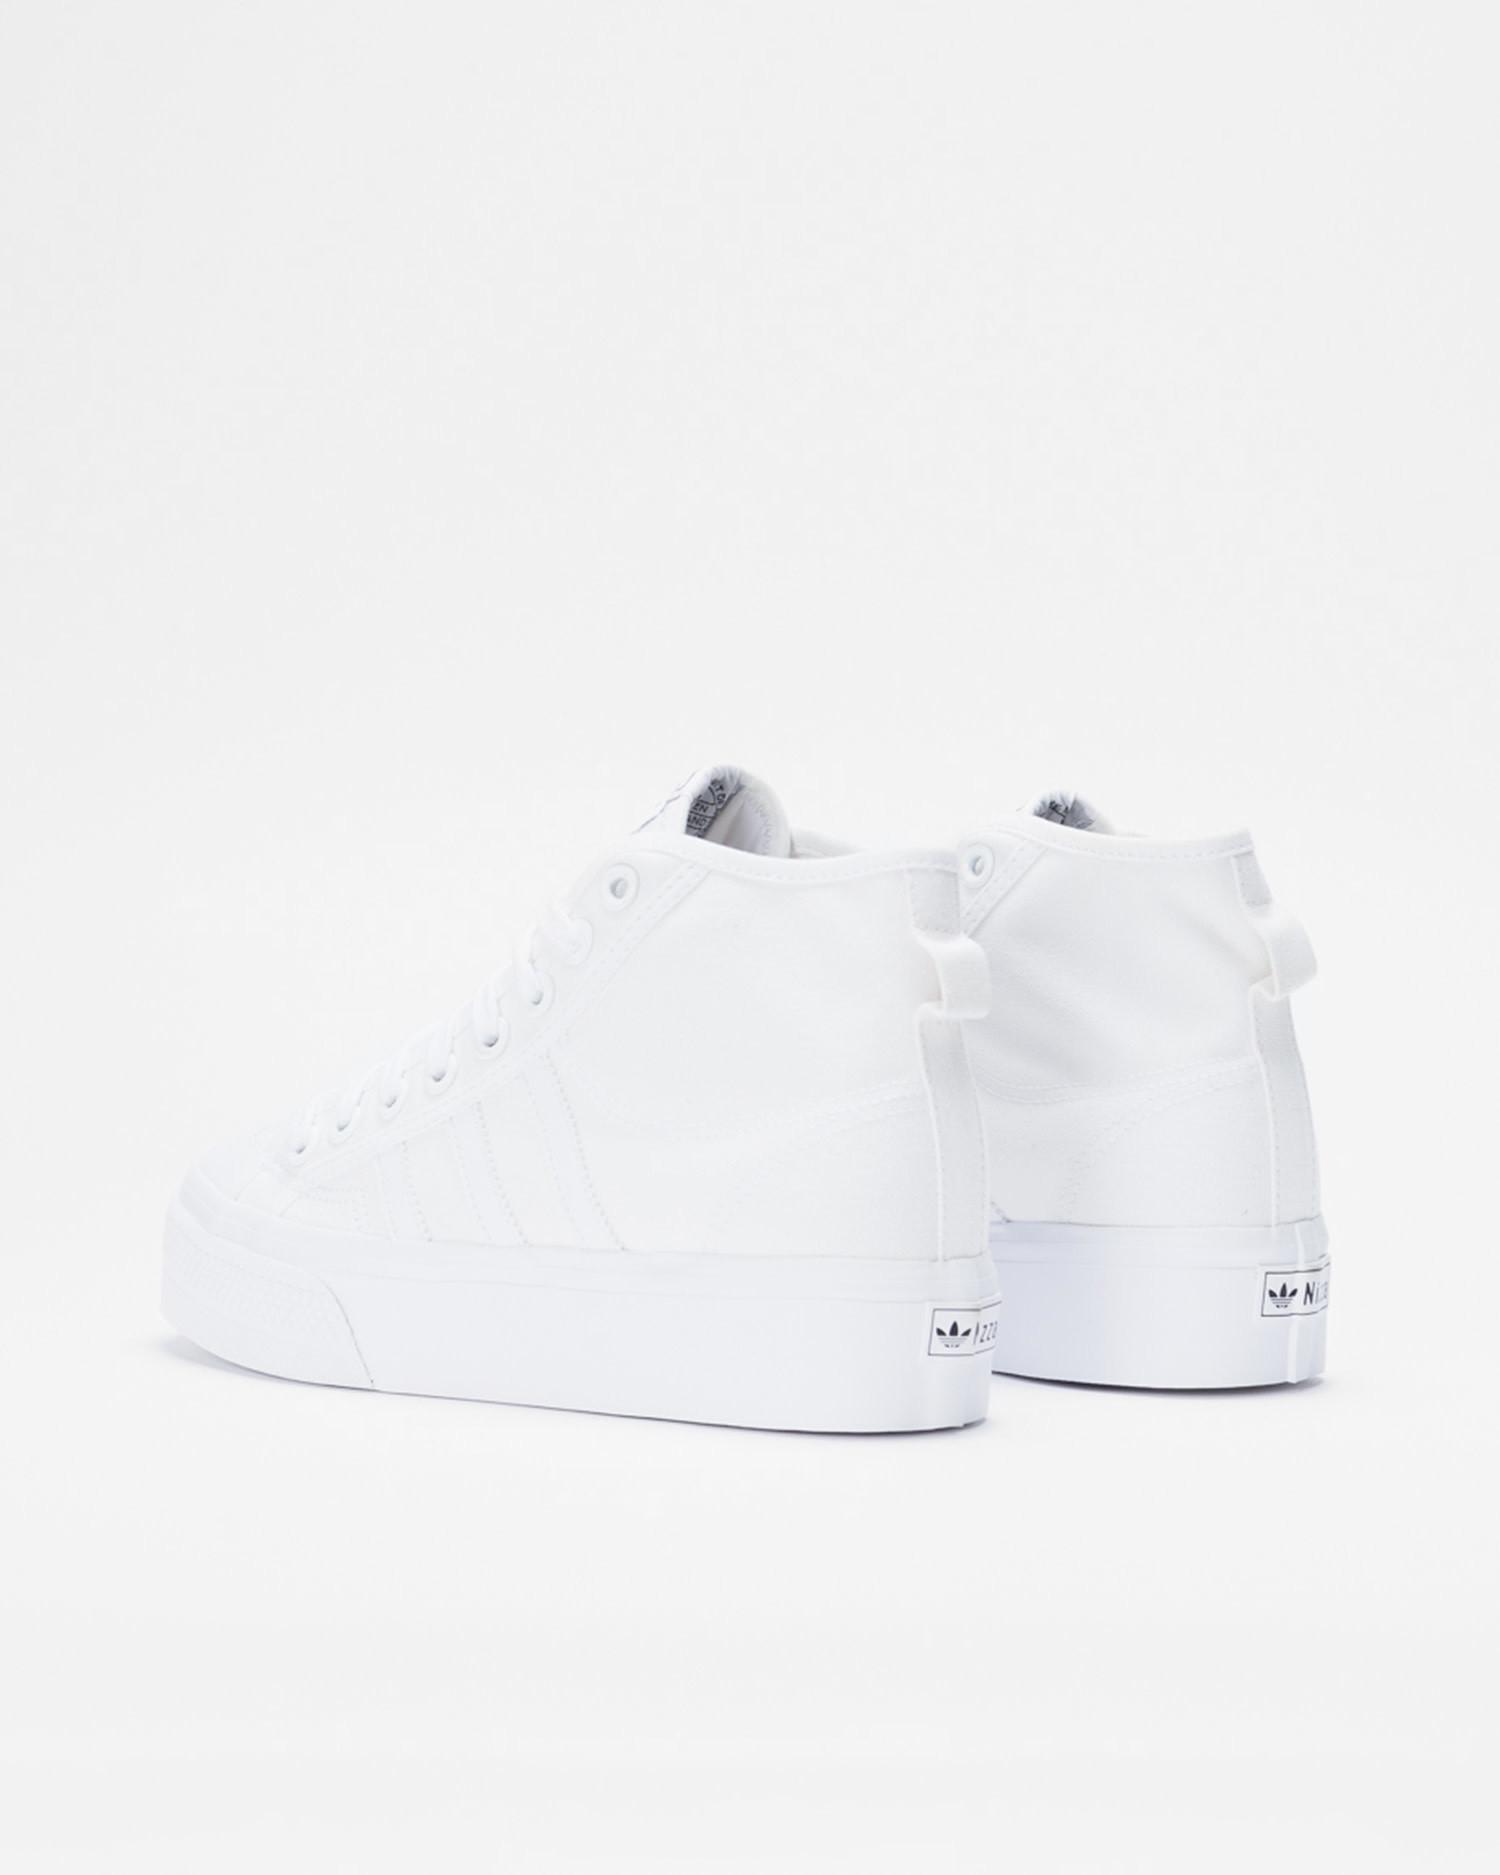 Adidas Nizza Platform Mid Ftwwht/Ftwwht